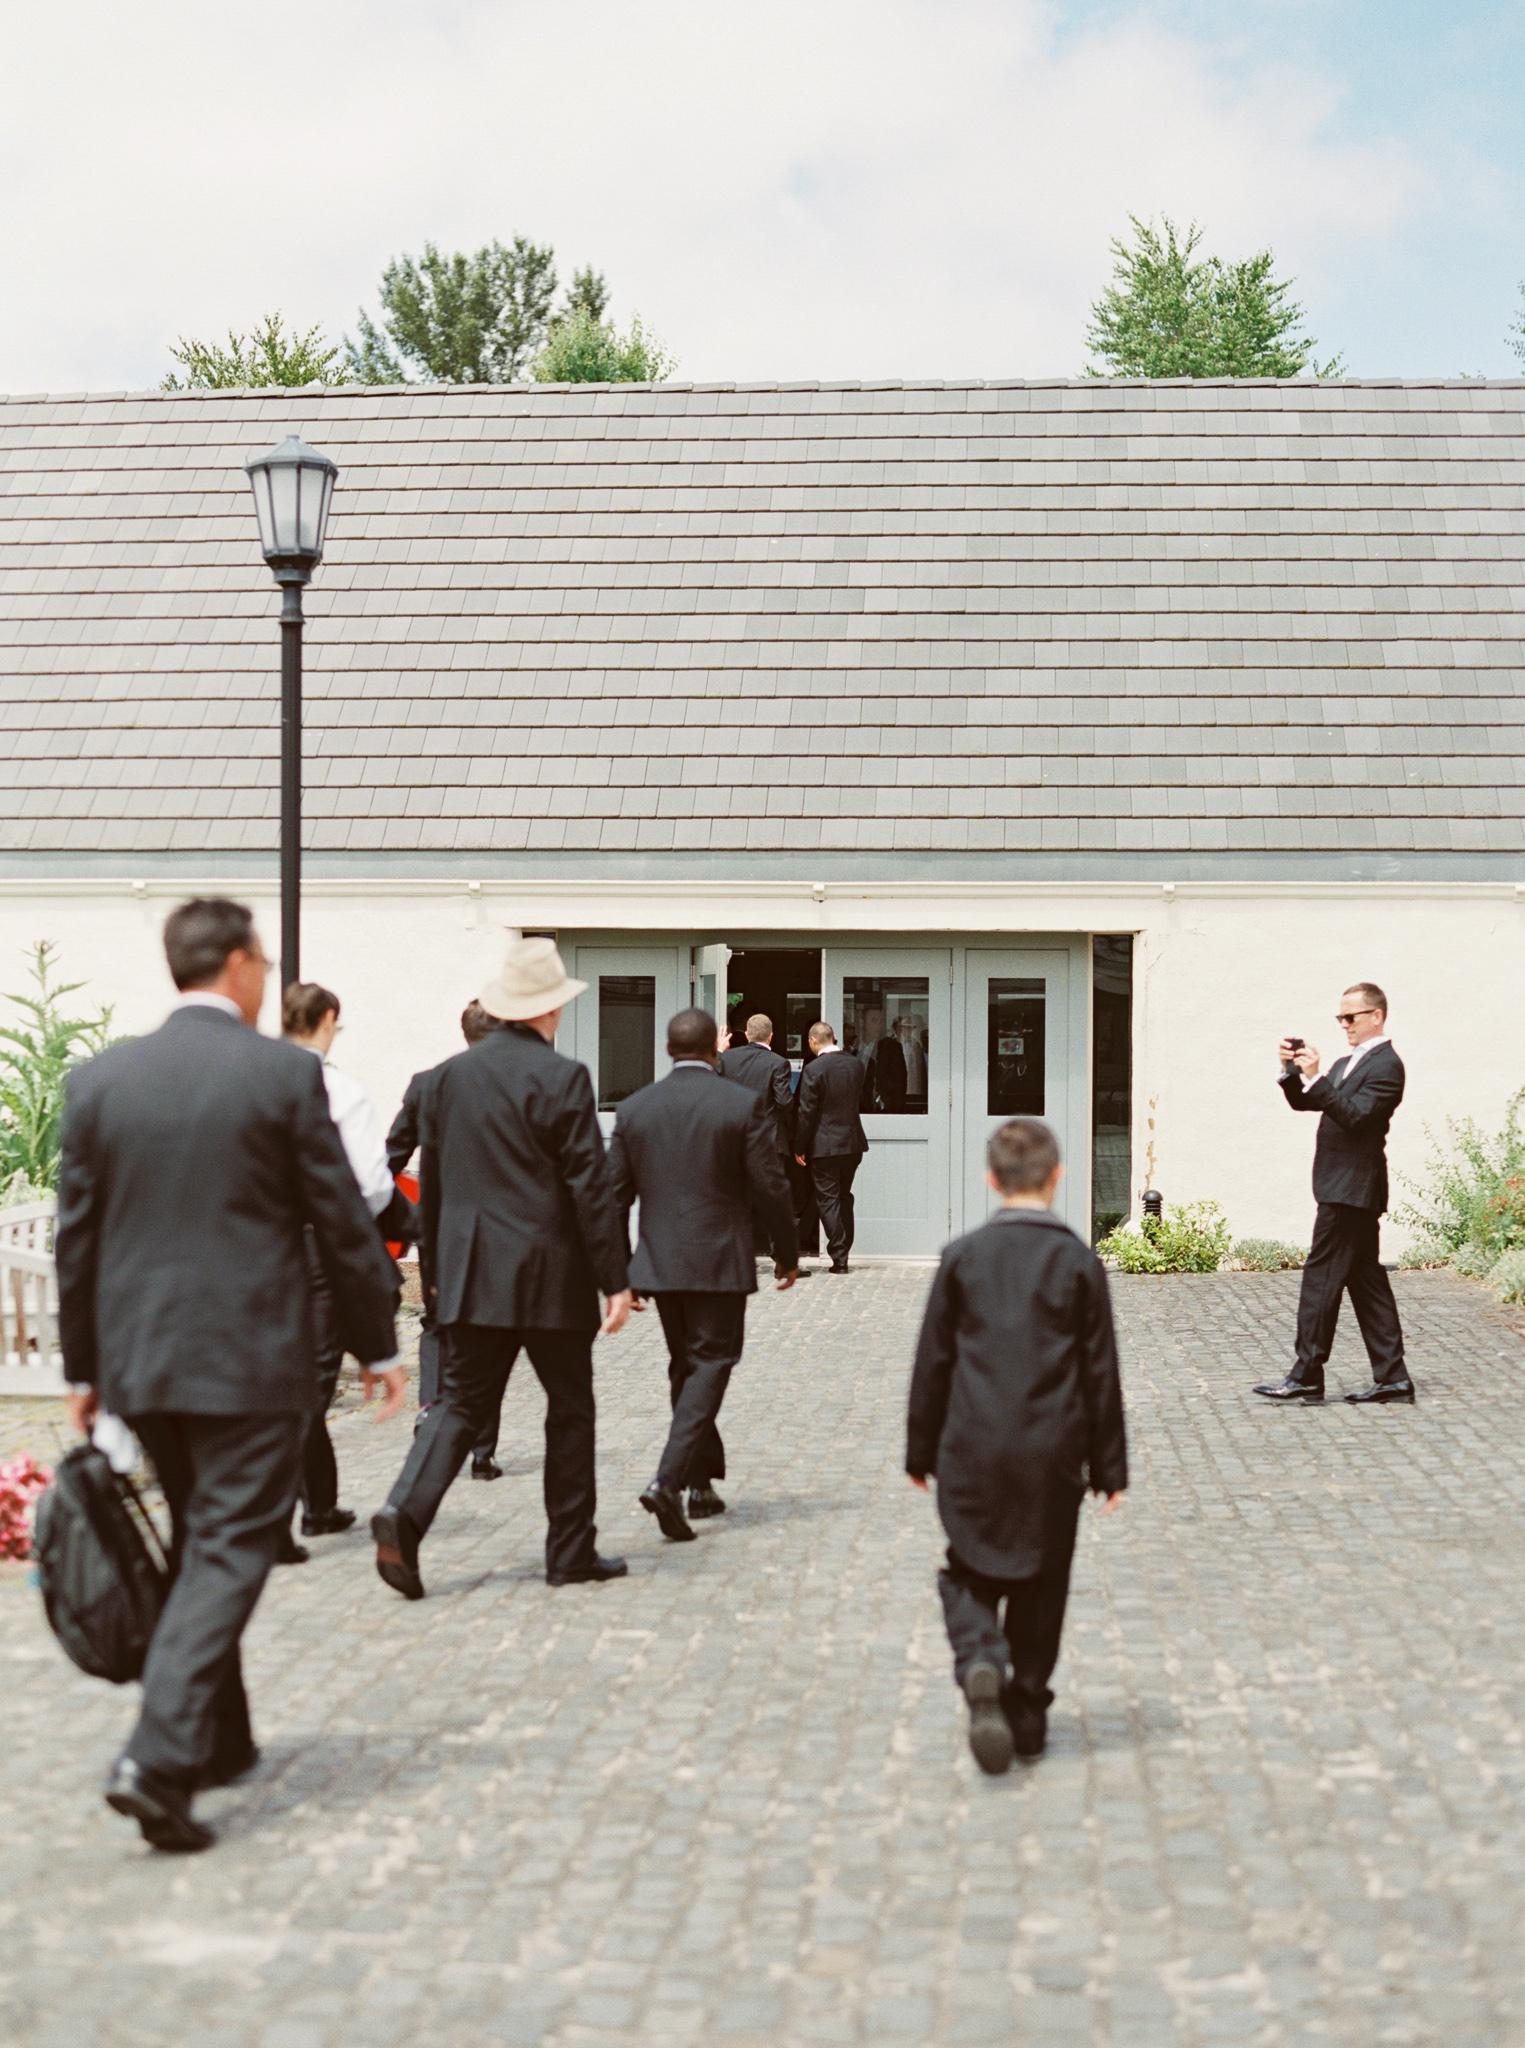 054OutliveCreative_Travel_Photographer_Videographer_Lewis&Clark_Oregon_Elegant_BlackTie_Destination_Wedding.jpg